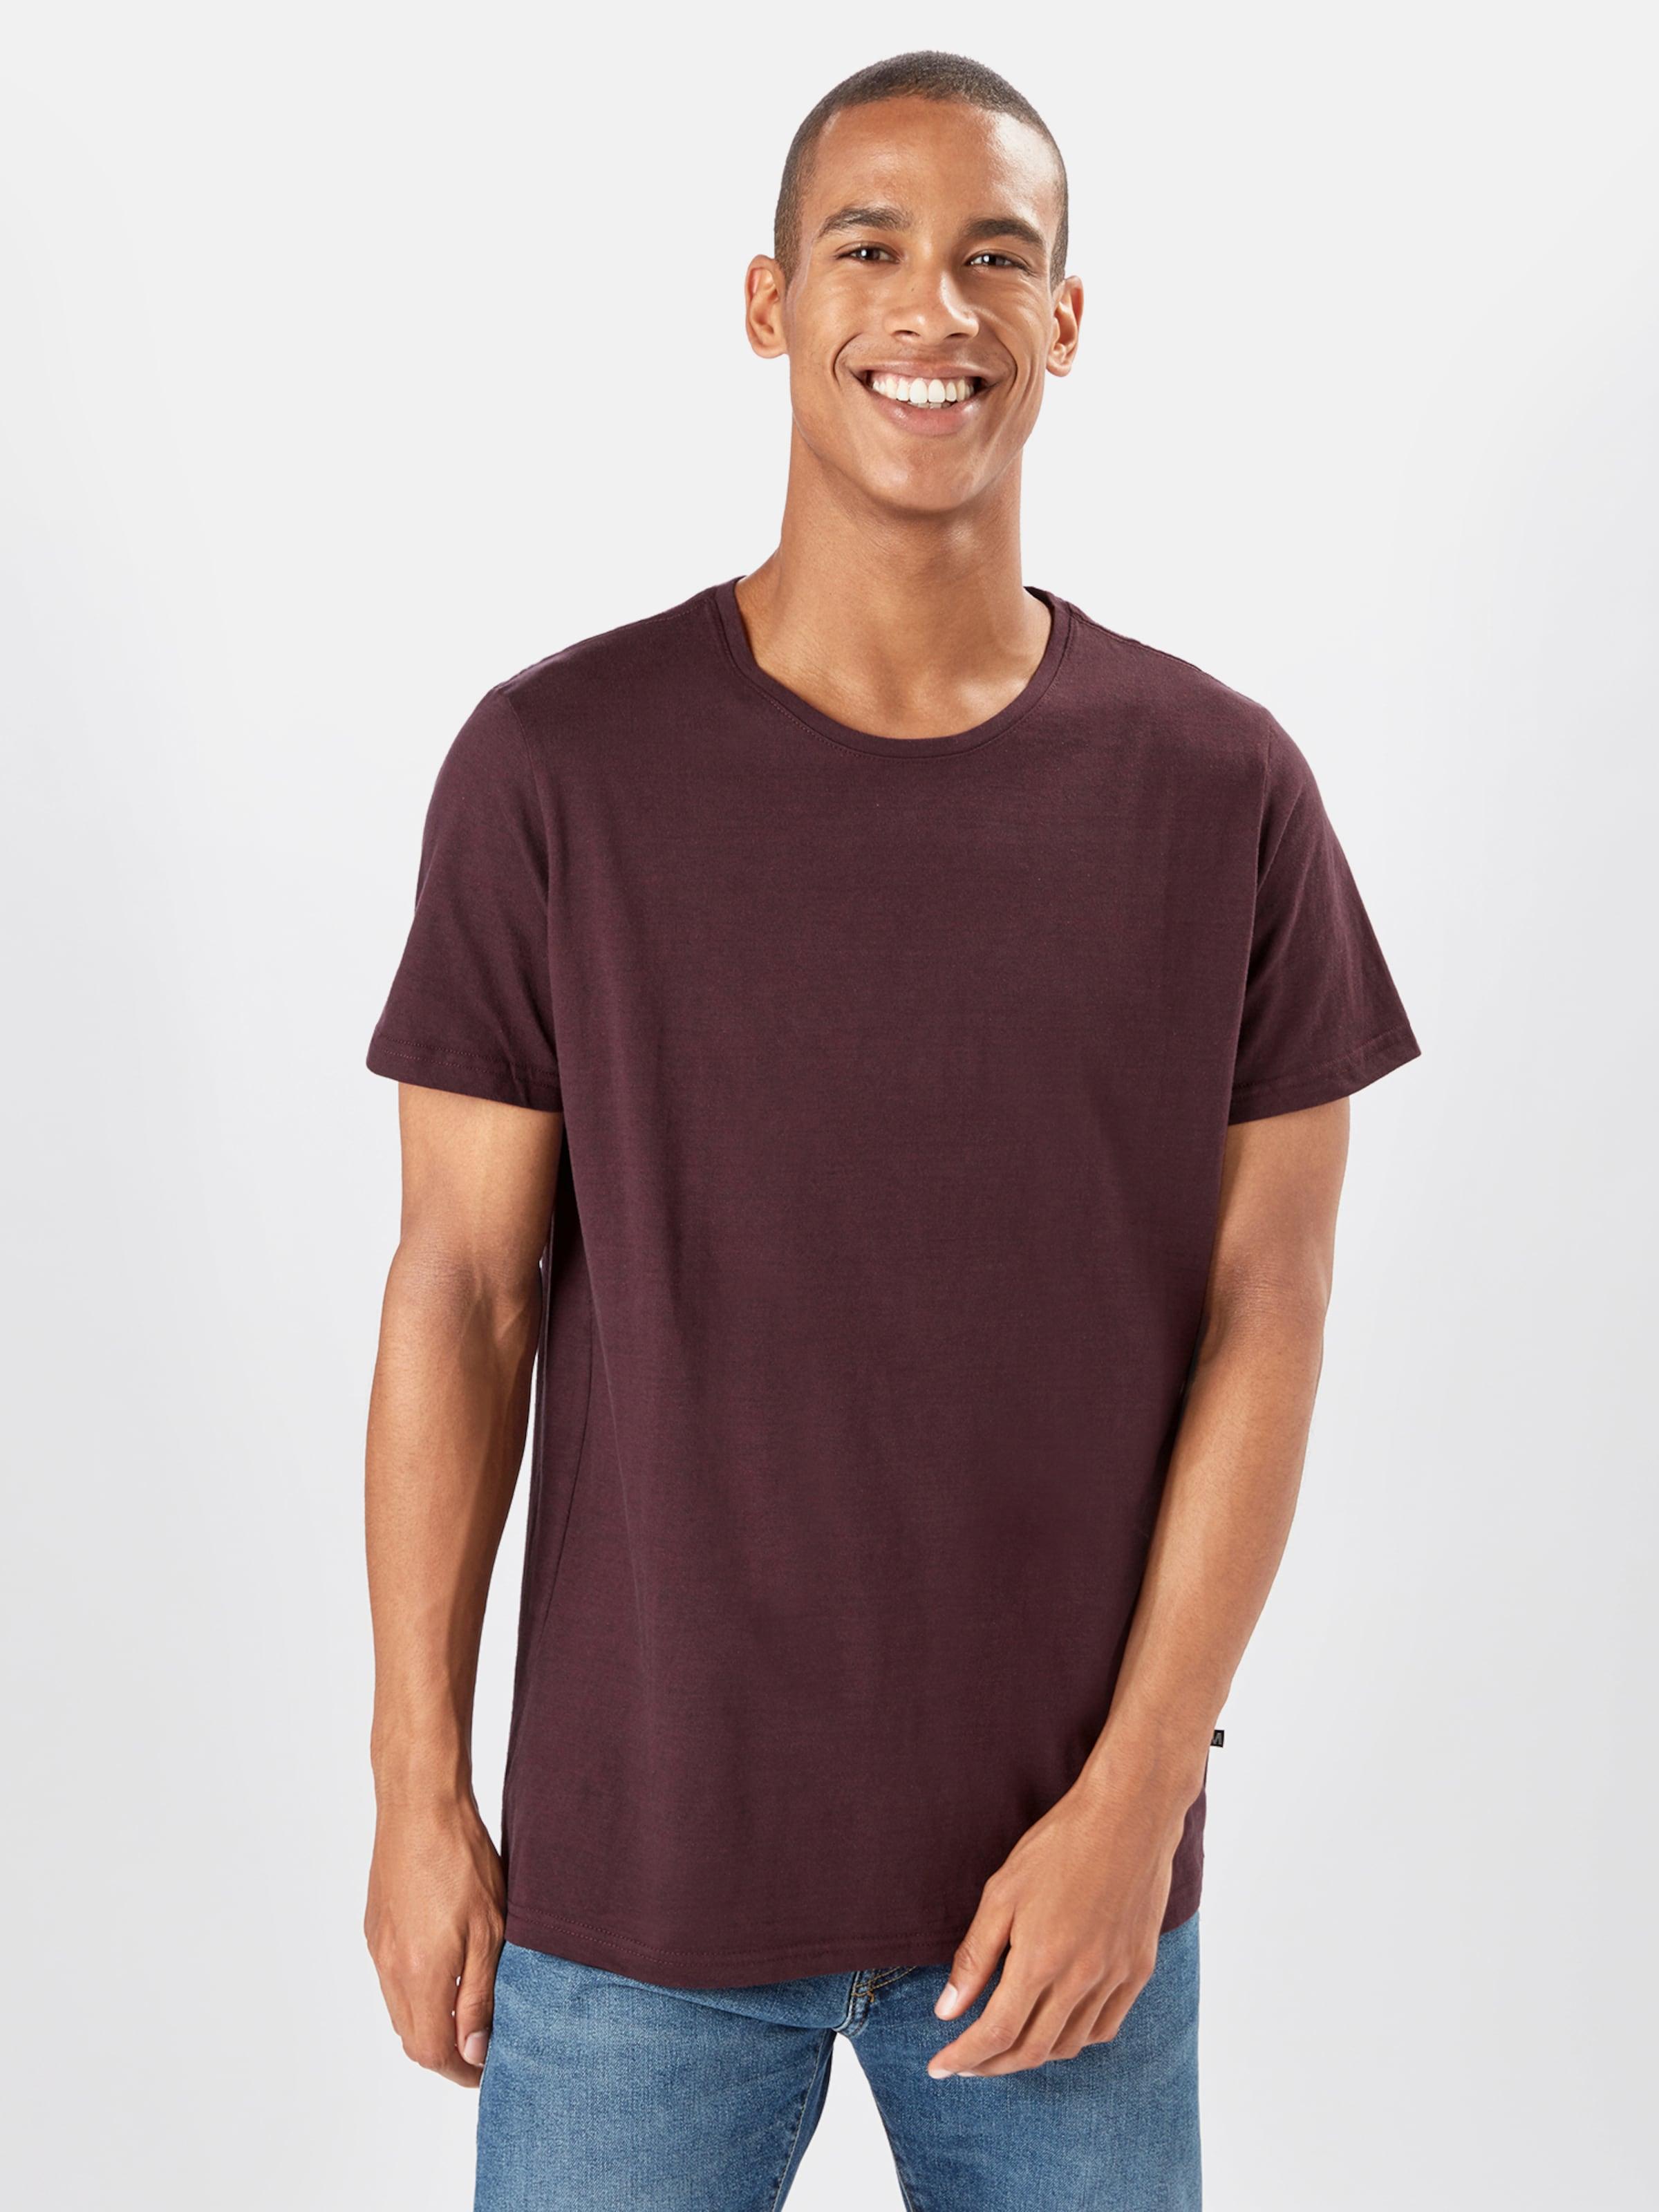 Matinique T-Shirt 'Jermane' in weinrot Unifarben MAT0068001000001